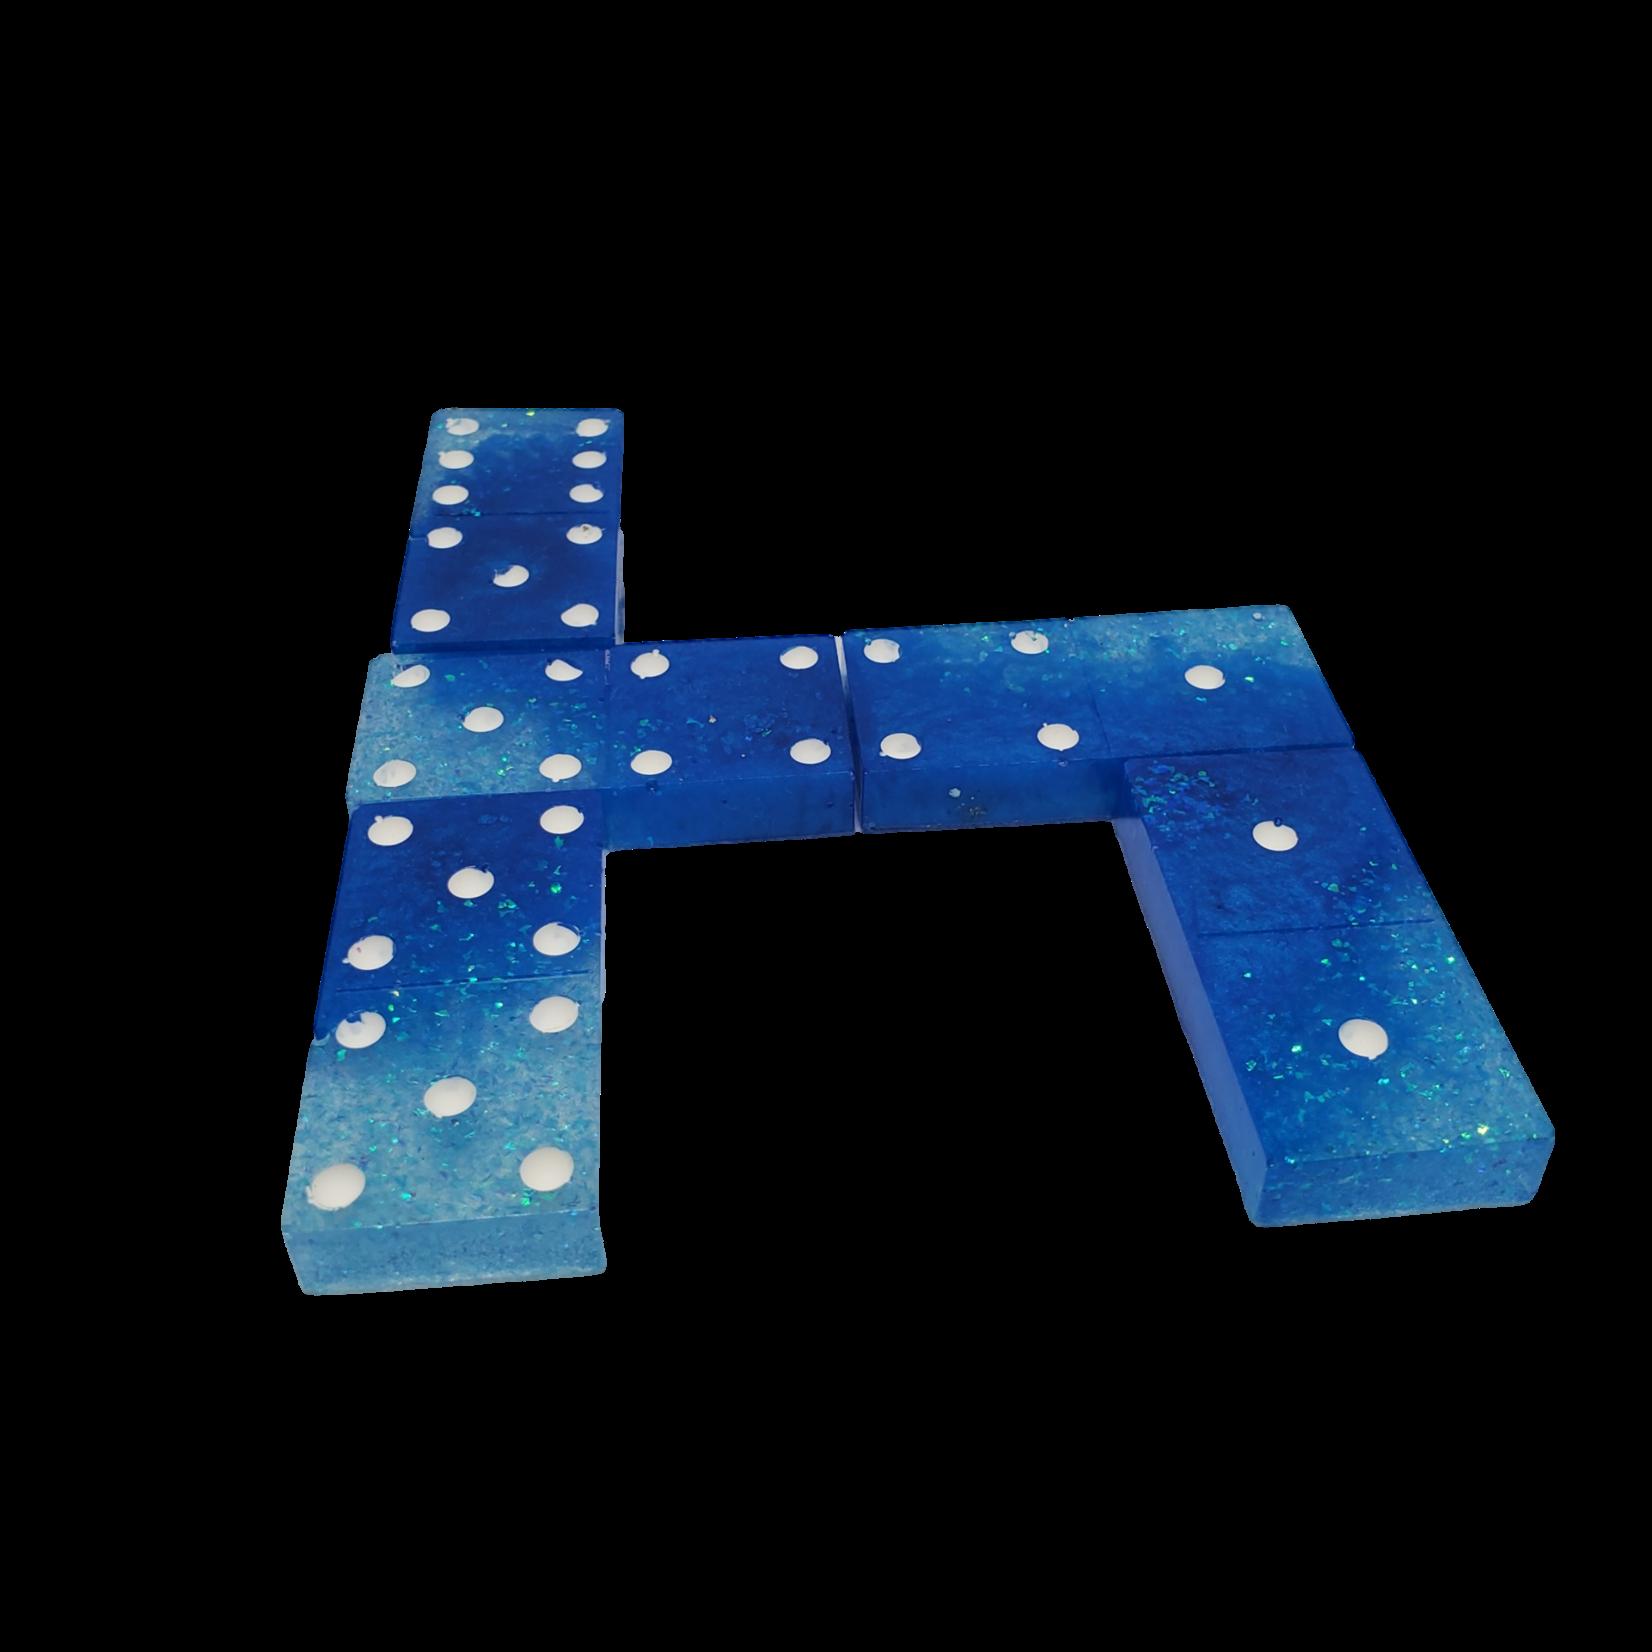 East Coast Sirens Blue Tones 28-piece Resin Domino Game Tiles